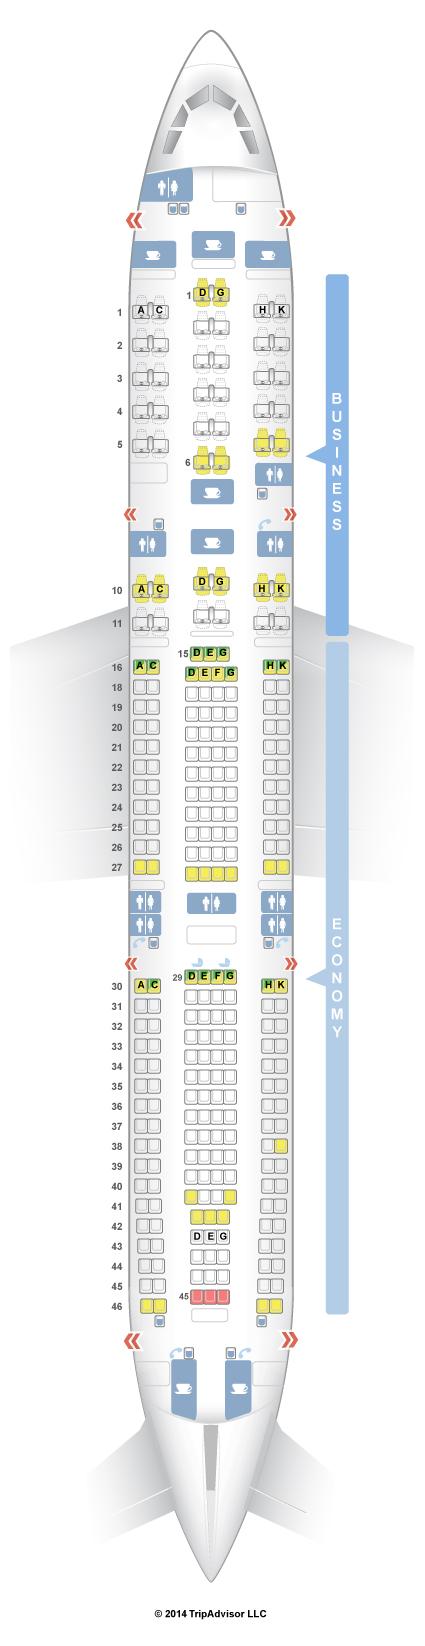 Seatguru Seat Map Lufthansa Airbus A340 300 343 V3 Plane Used For